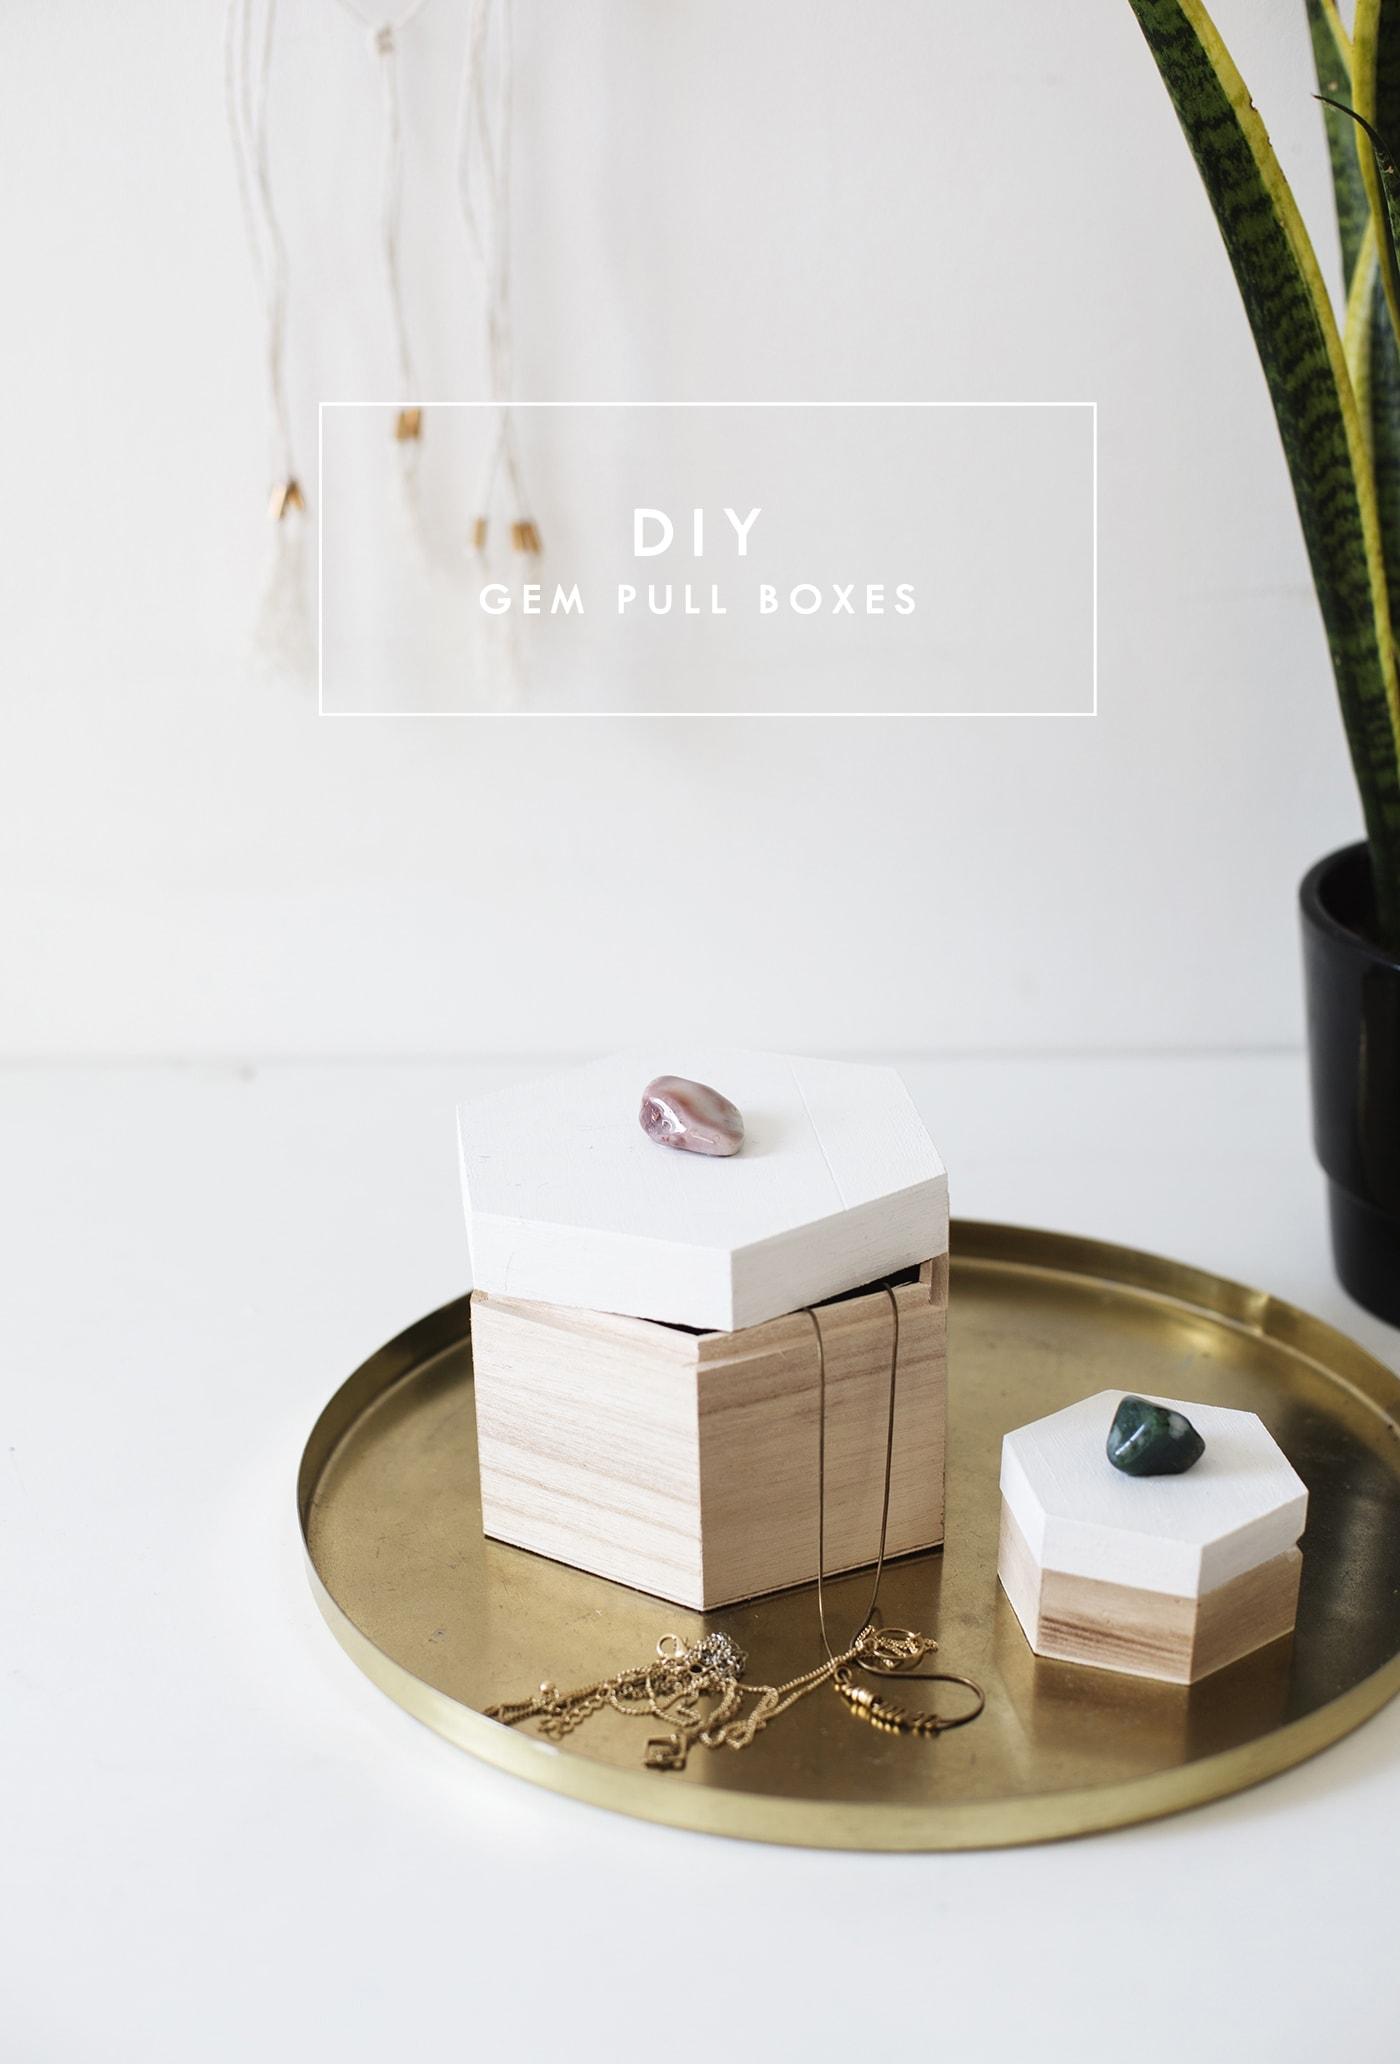 diy-gem-pull-box-storage-simple-tutorial